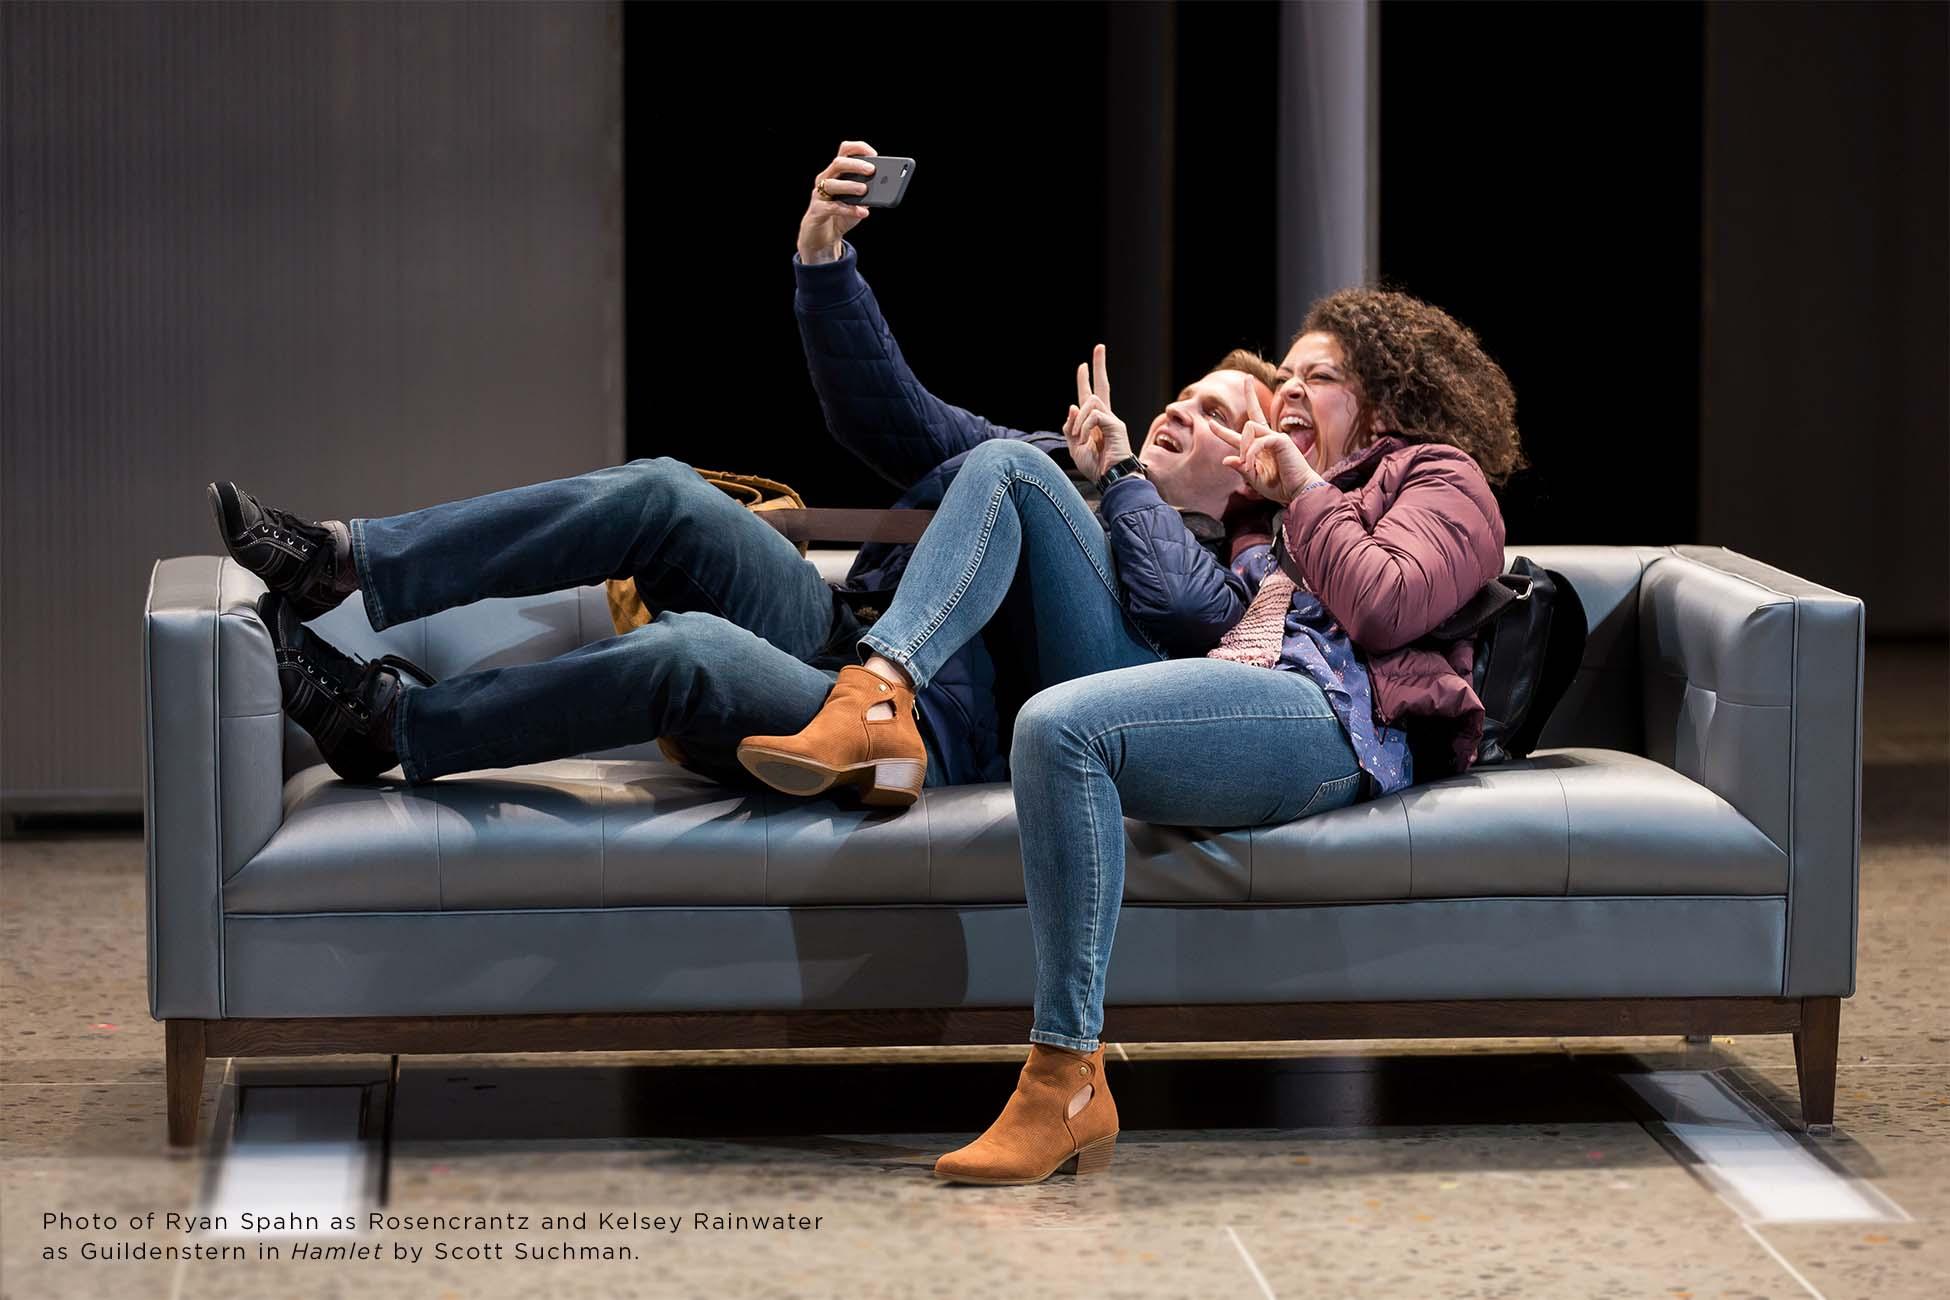 Photo of Ryan Spahn and Kelsey Rainwater by Scott Suchman.